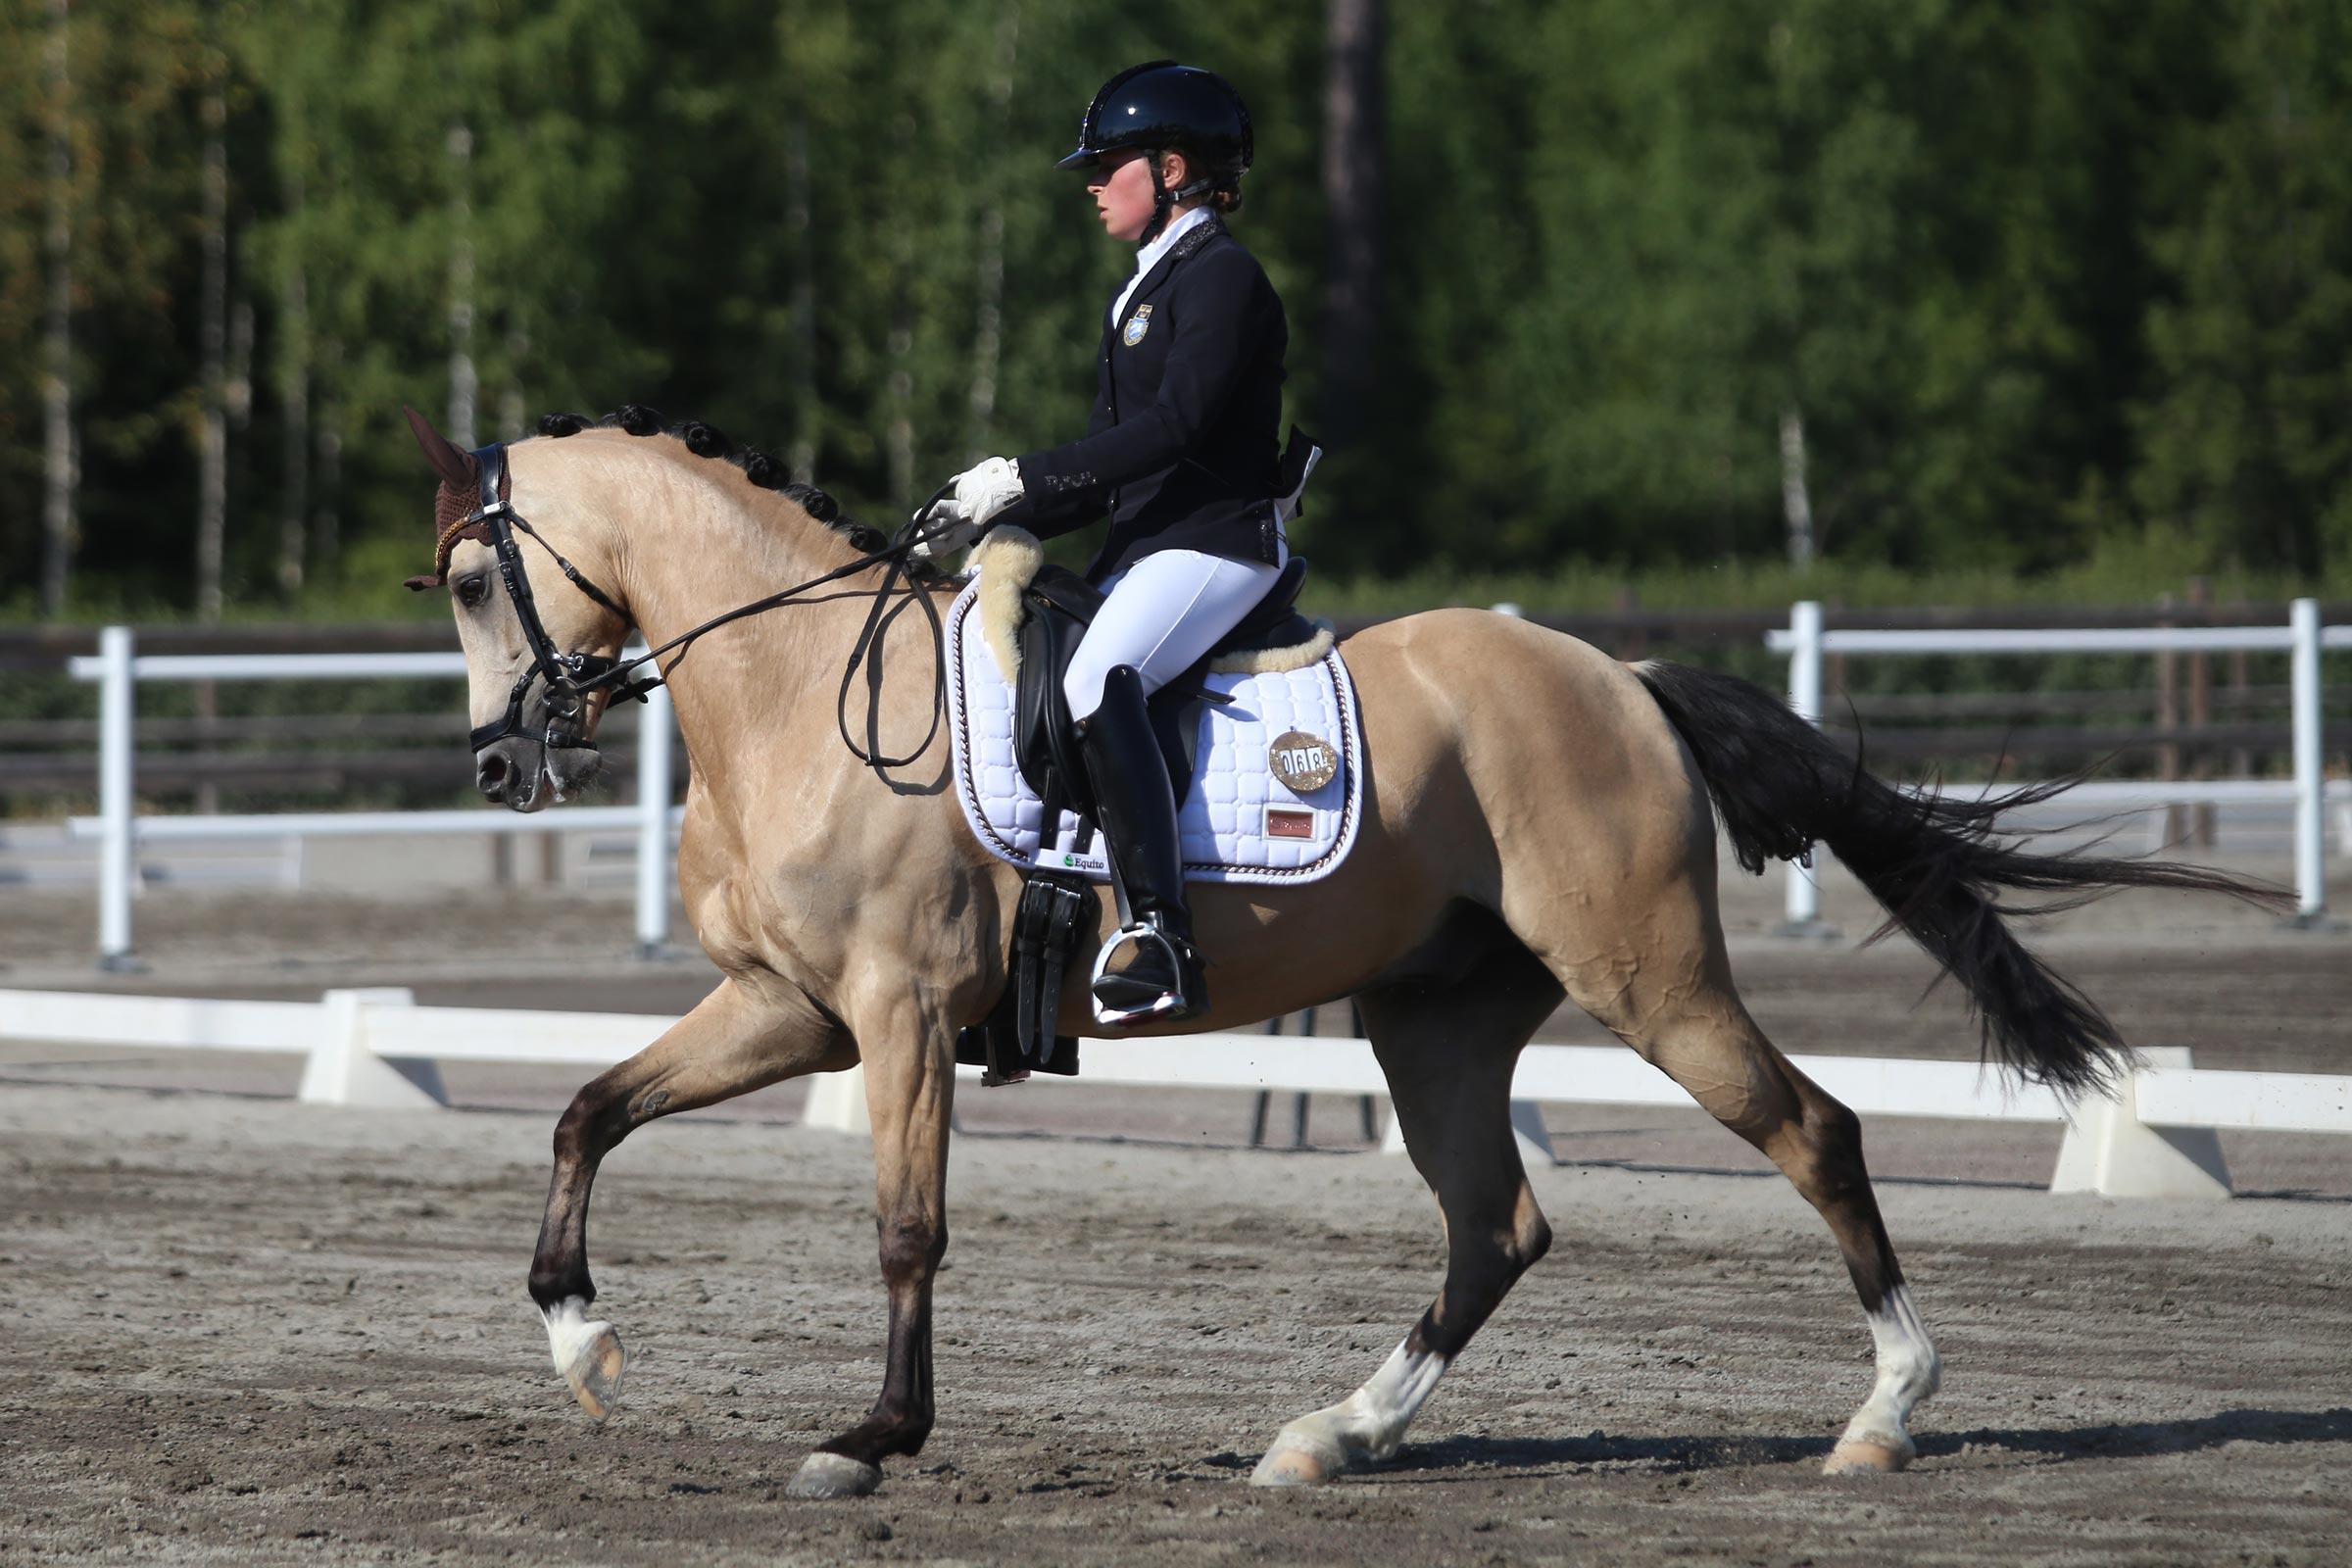 Silver: Ebba Nilsson - Hamilton (NWPCS val f-13 e Brouwershaven Diamond Hit-Veenstra's Promise, uppf L. Snippe) 165,800